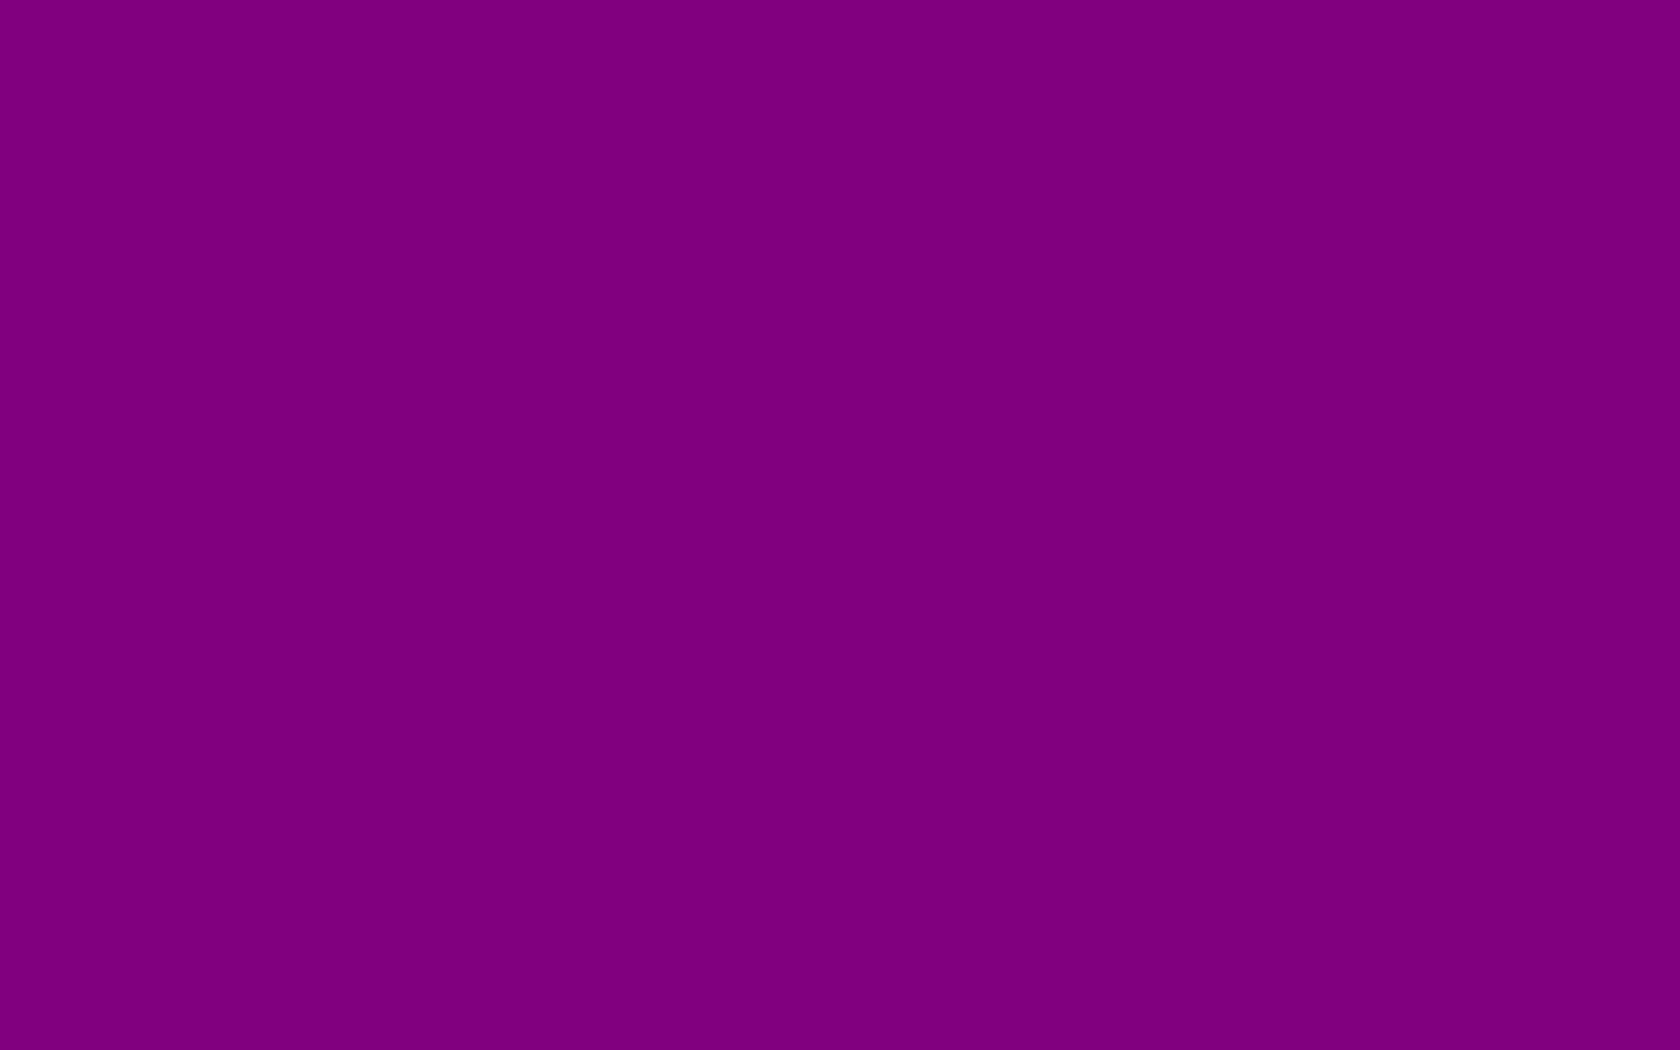 1680x1050 Purple Web Solid Color Background